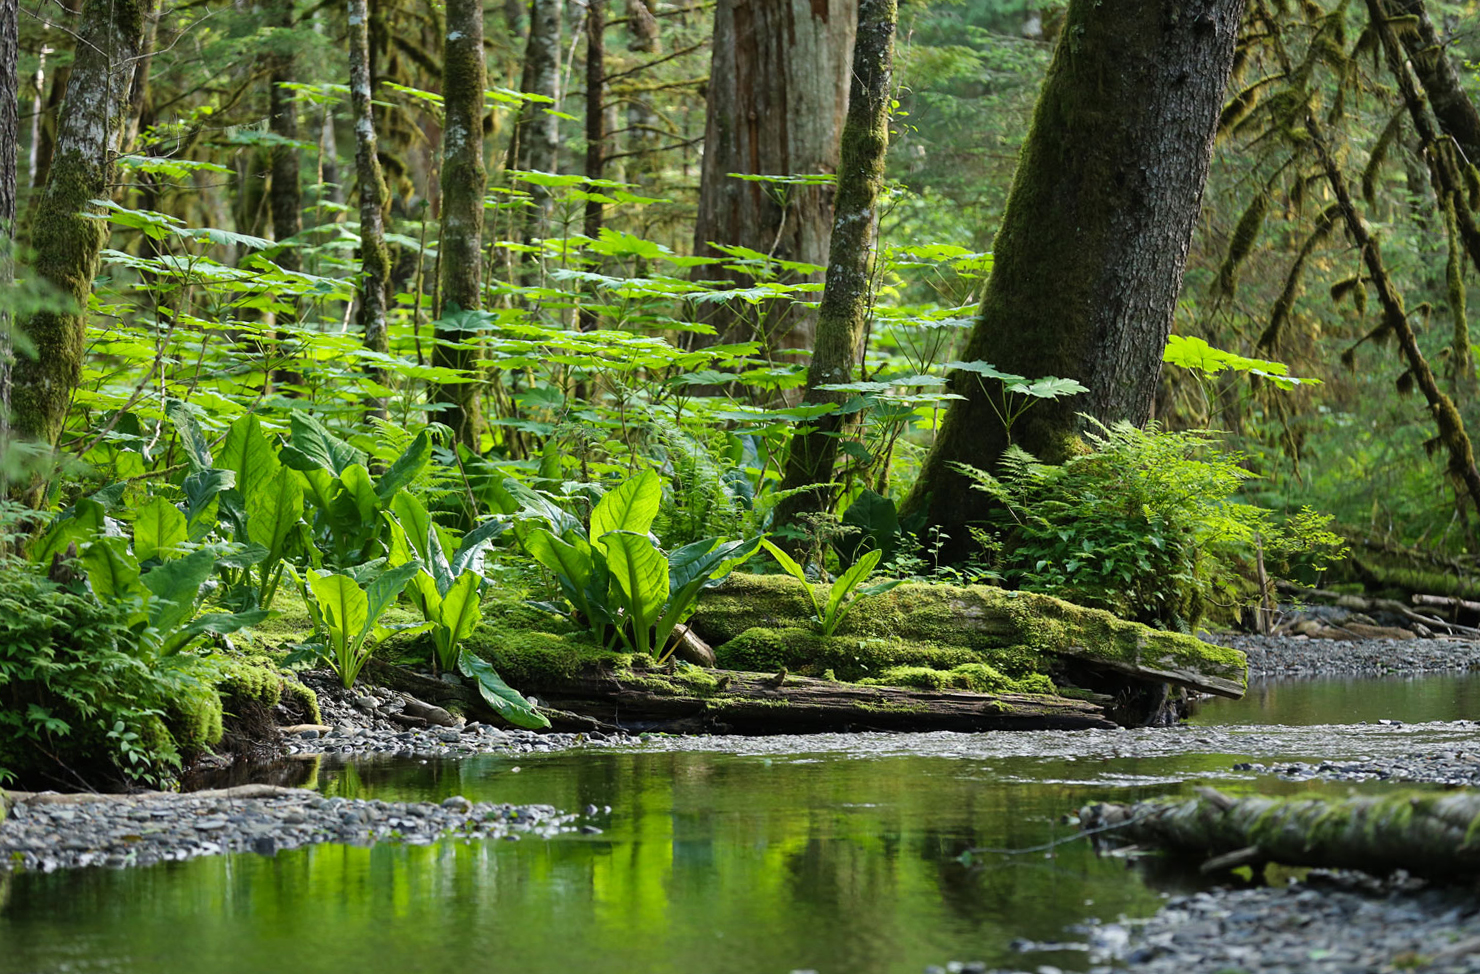 Forest stream in Southeast Alaska